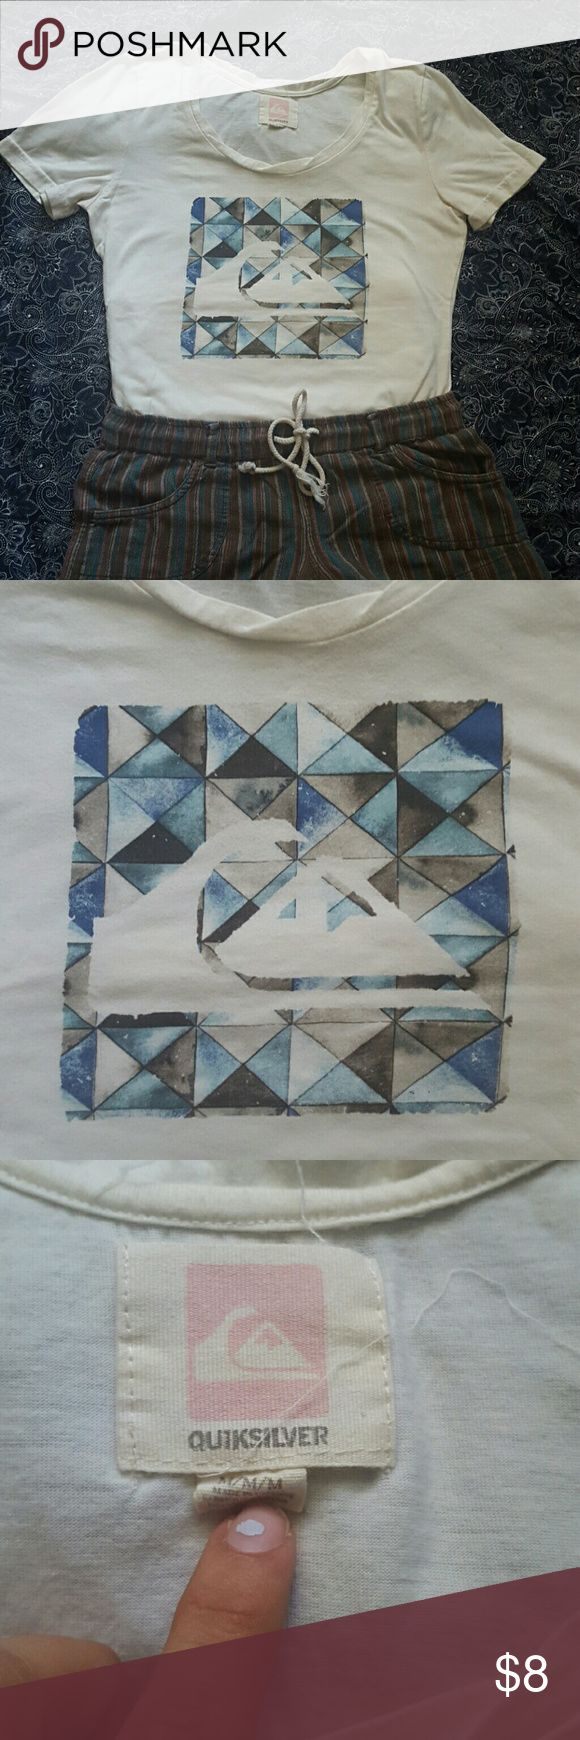 QUIKSILVER WOMENS TEE Cream colored tee shirt Quiksilver Tops Tees - Short Sleeve